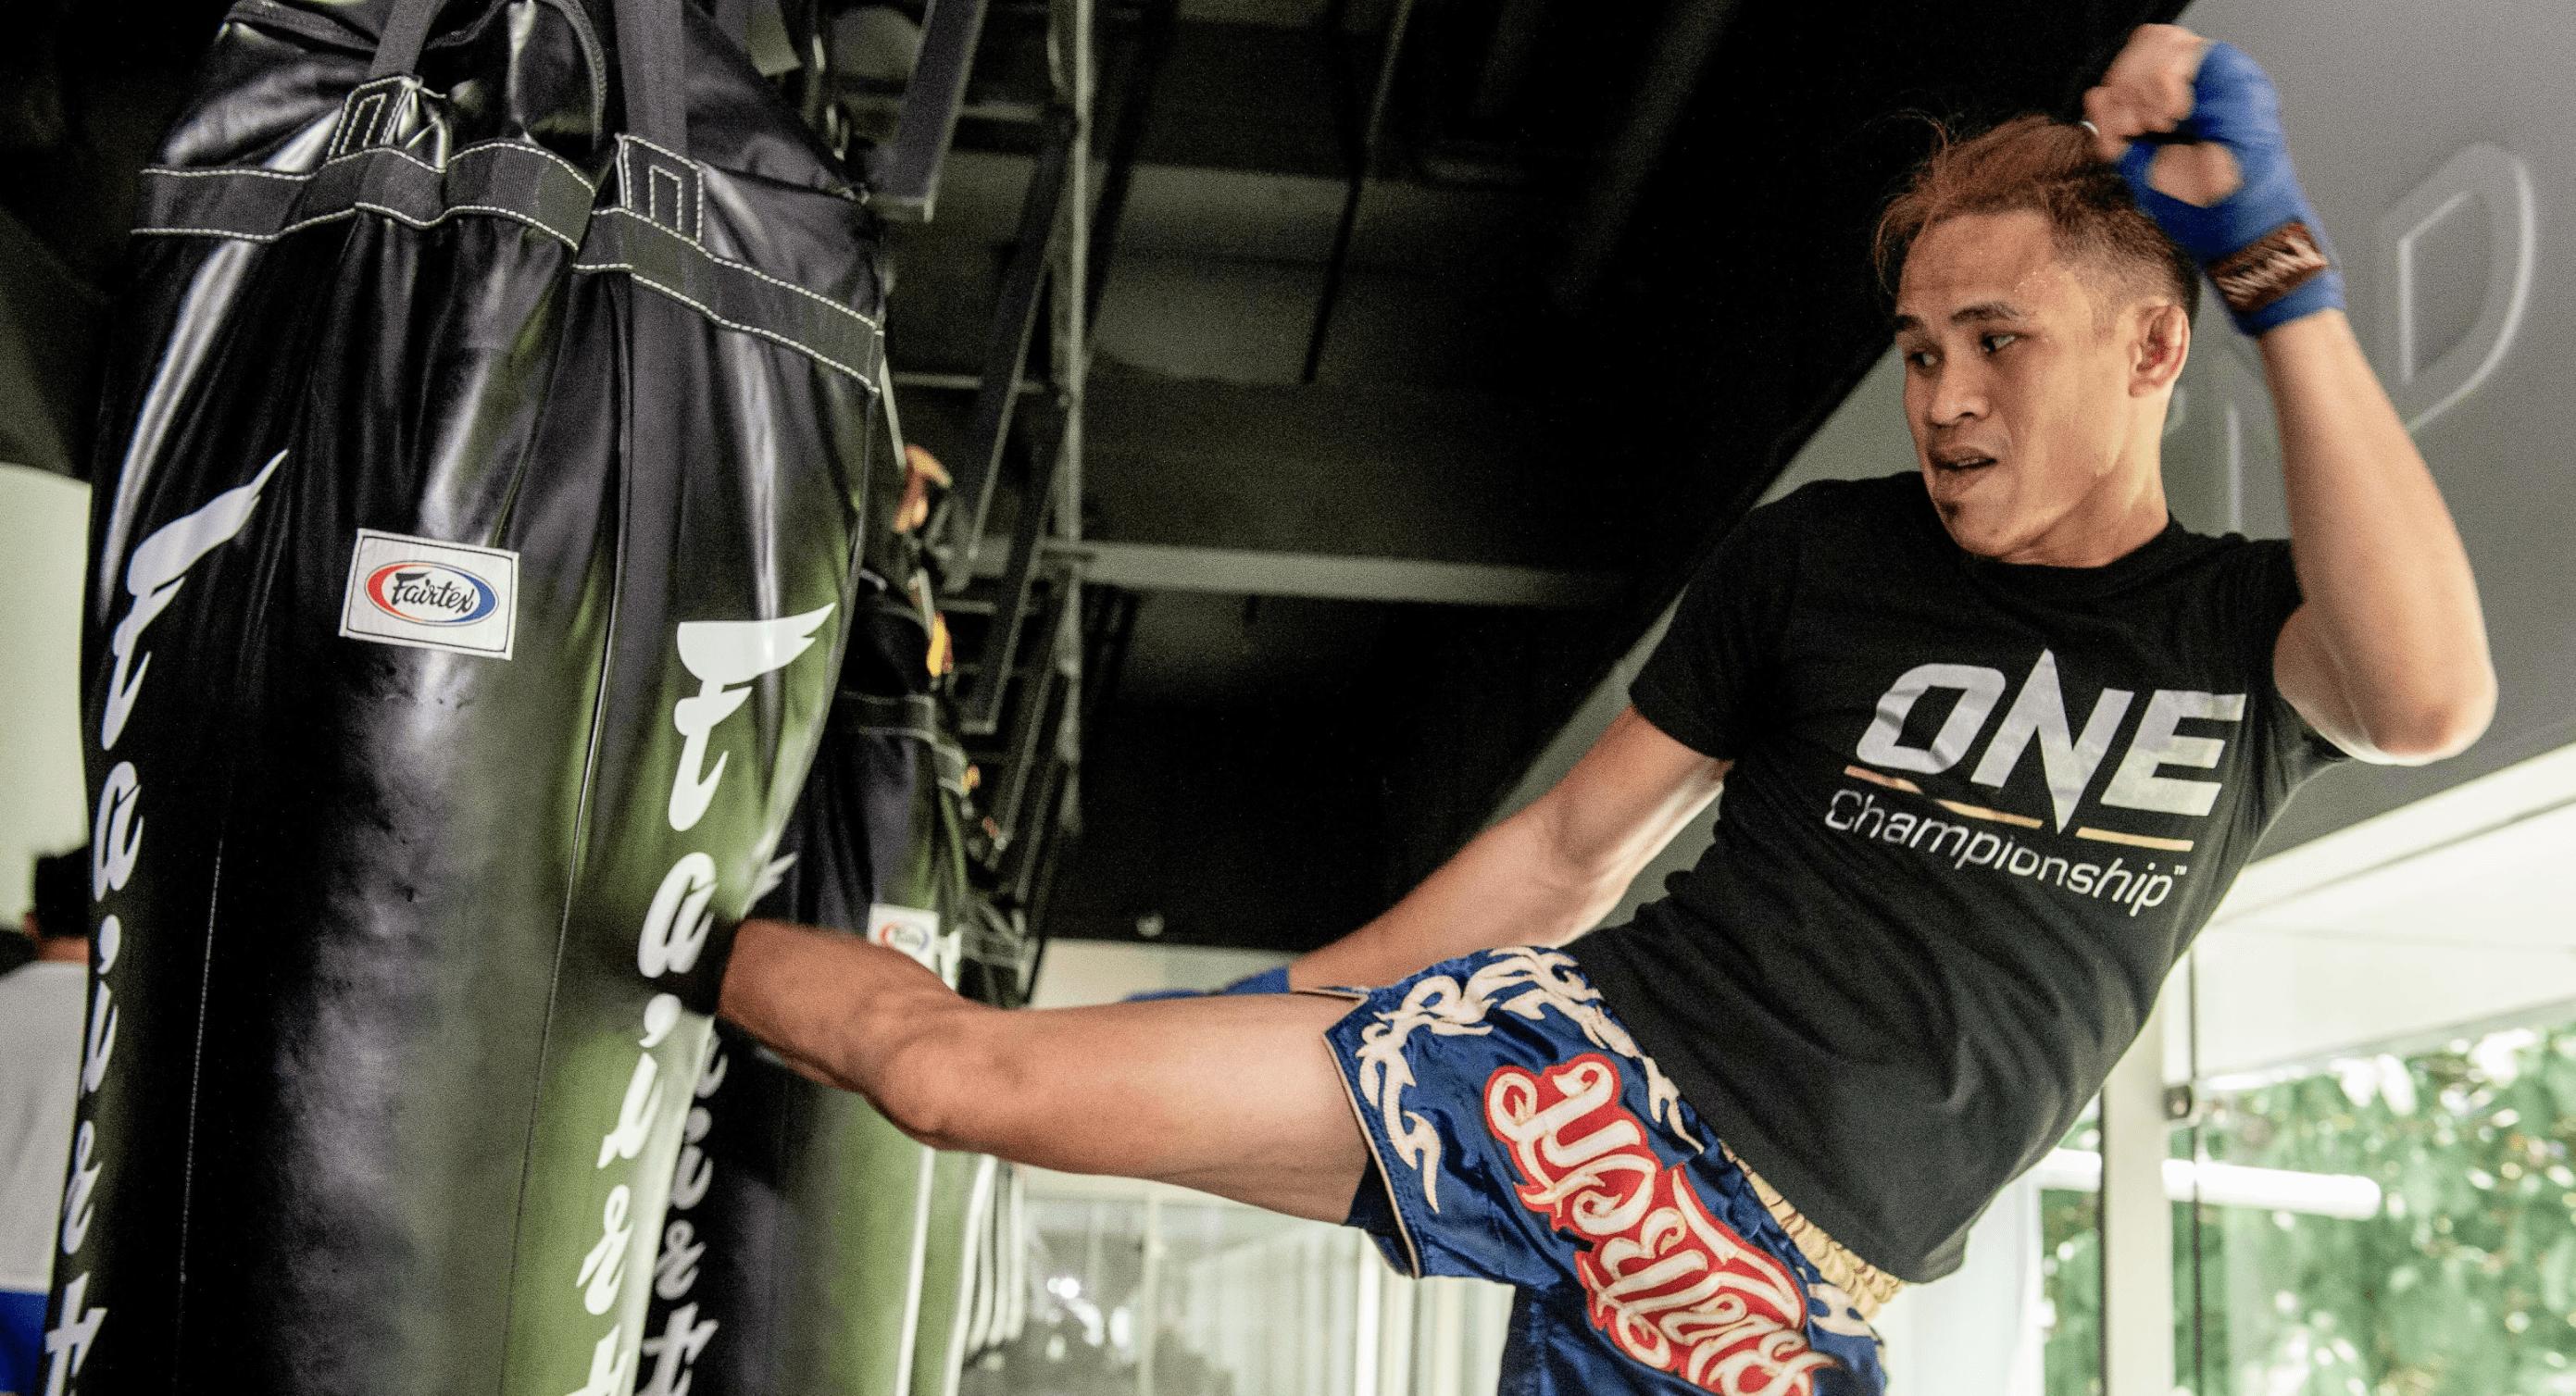 Jeremy Miado Embraces The Respect Shown In Martial Arts